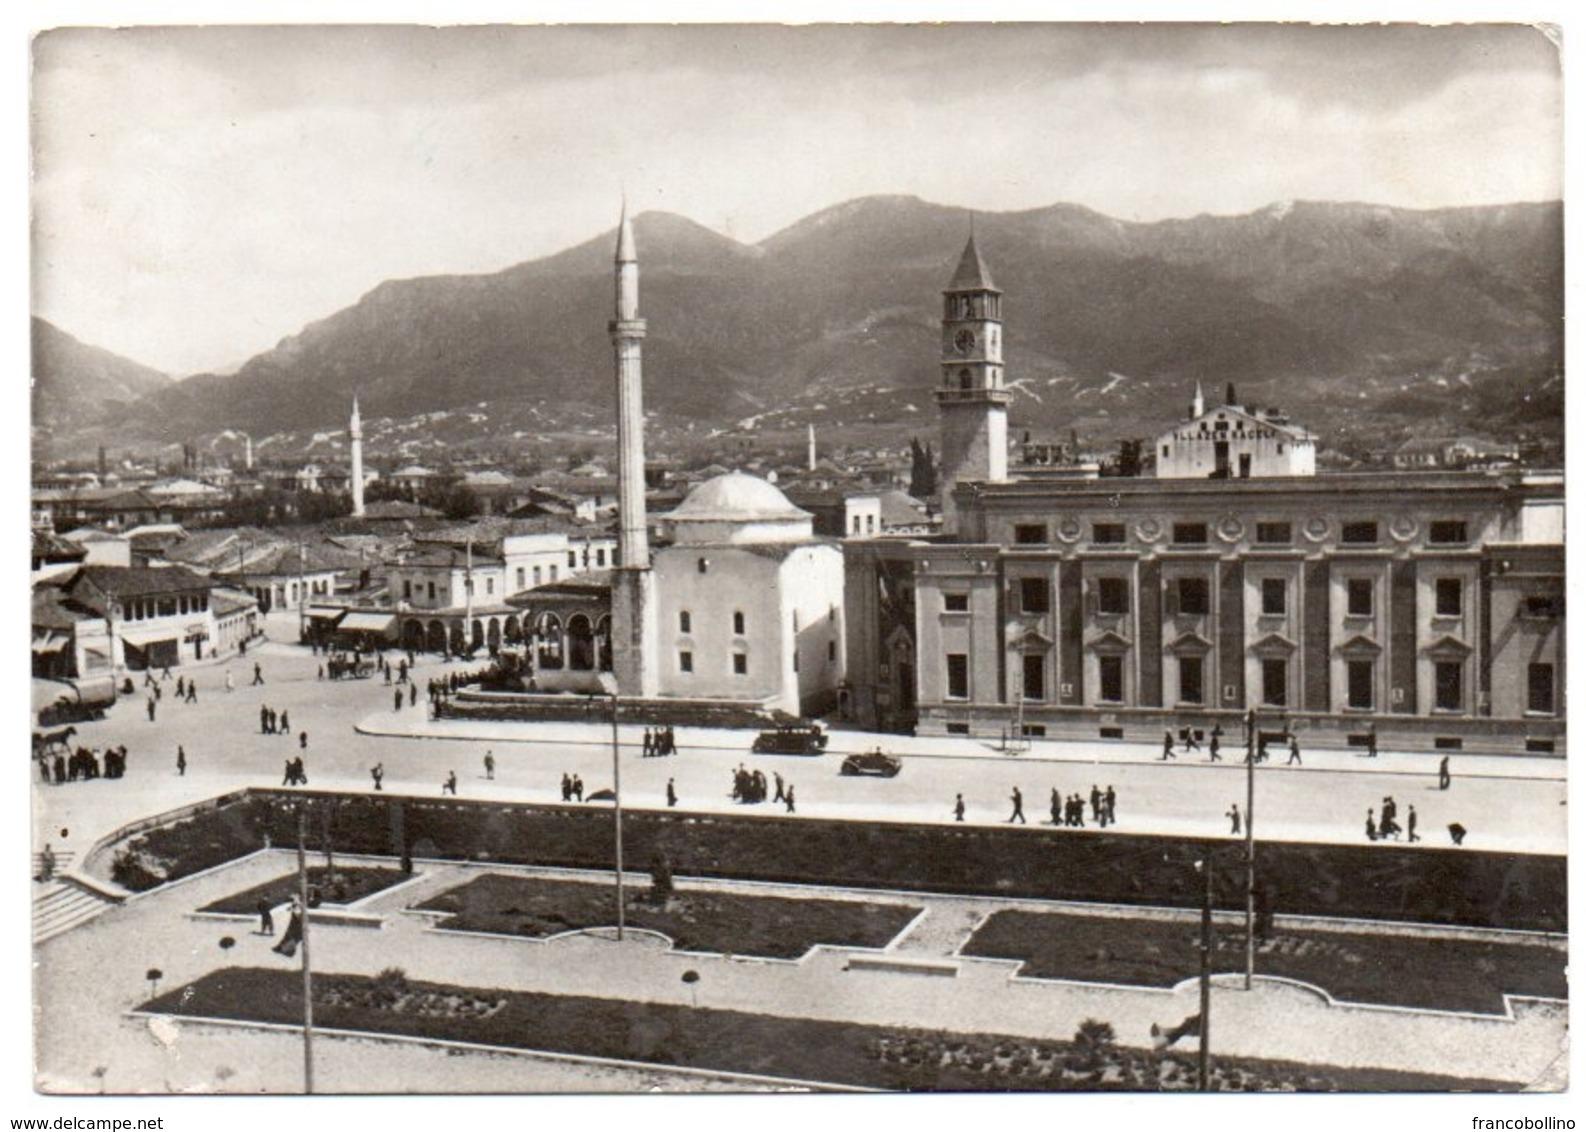 ALBANIE/ALBANIA - TIRANA/TIRANE PANORAMA / PIAZZA SCANDERBEG / MOSQUE - Albania